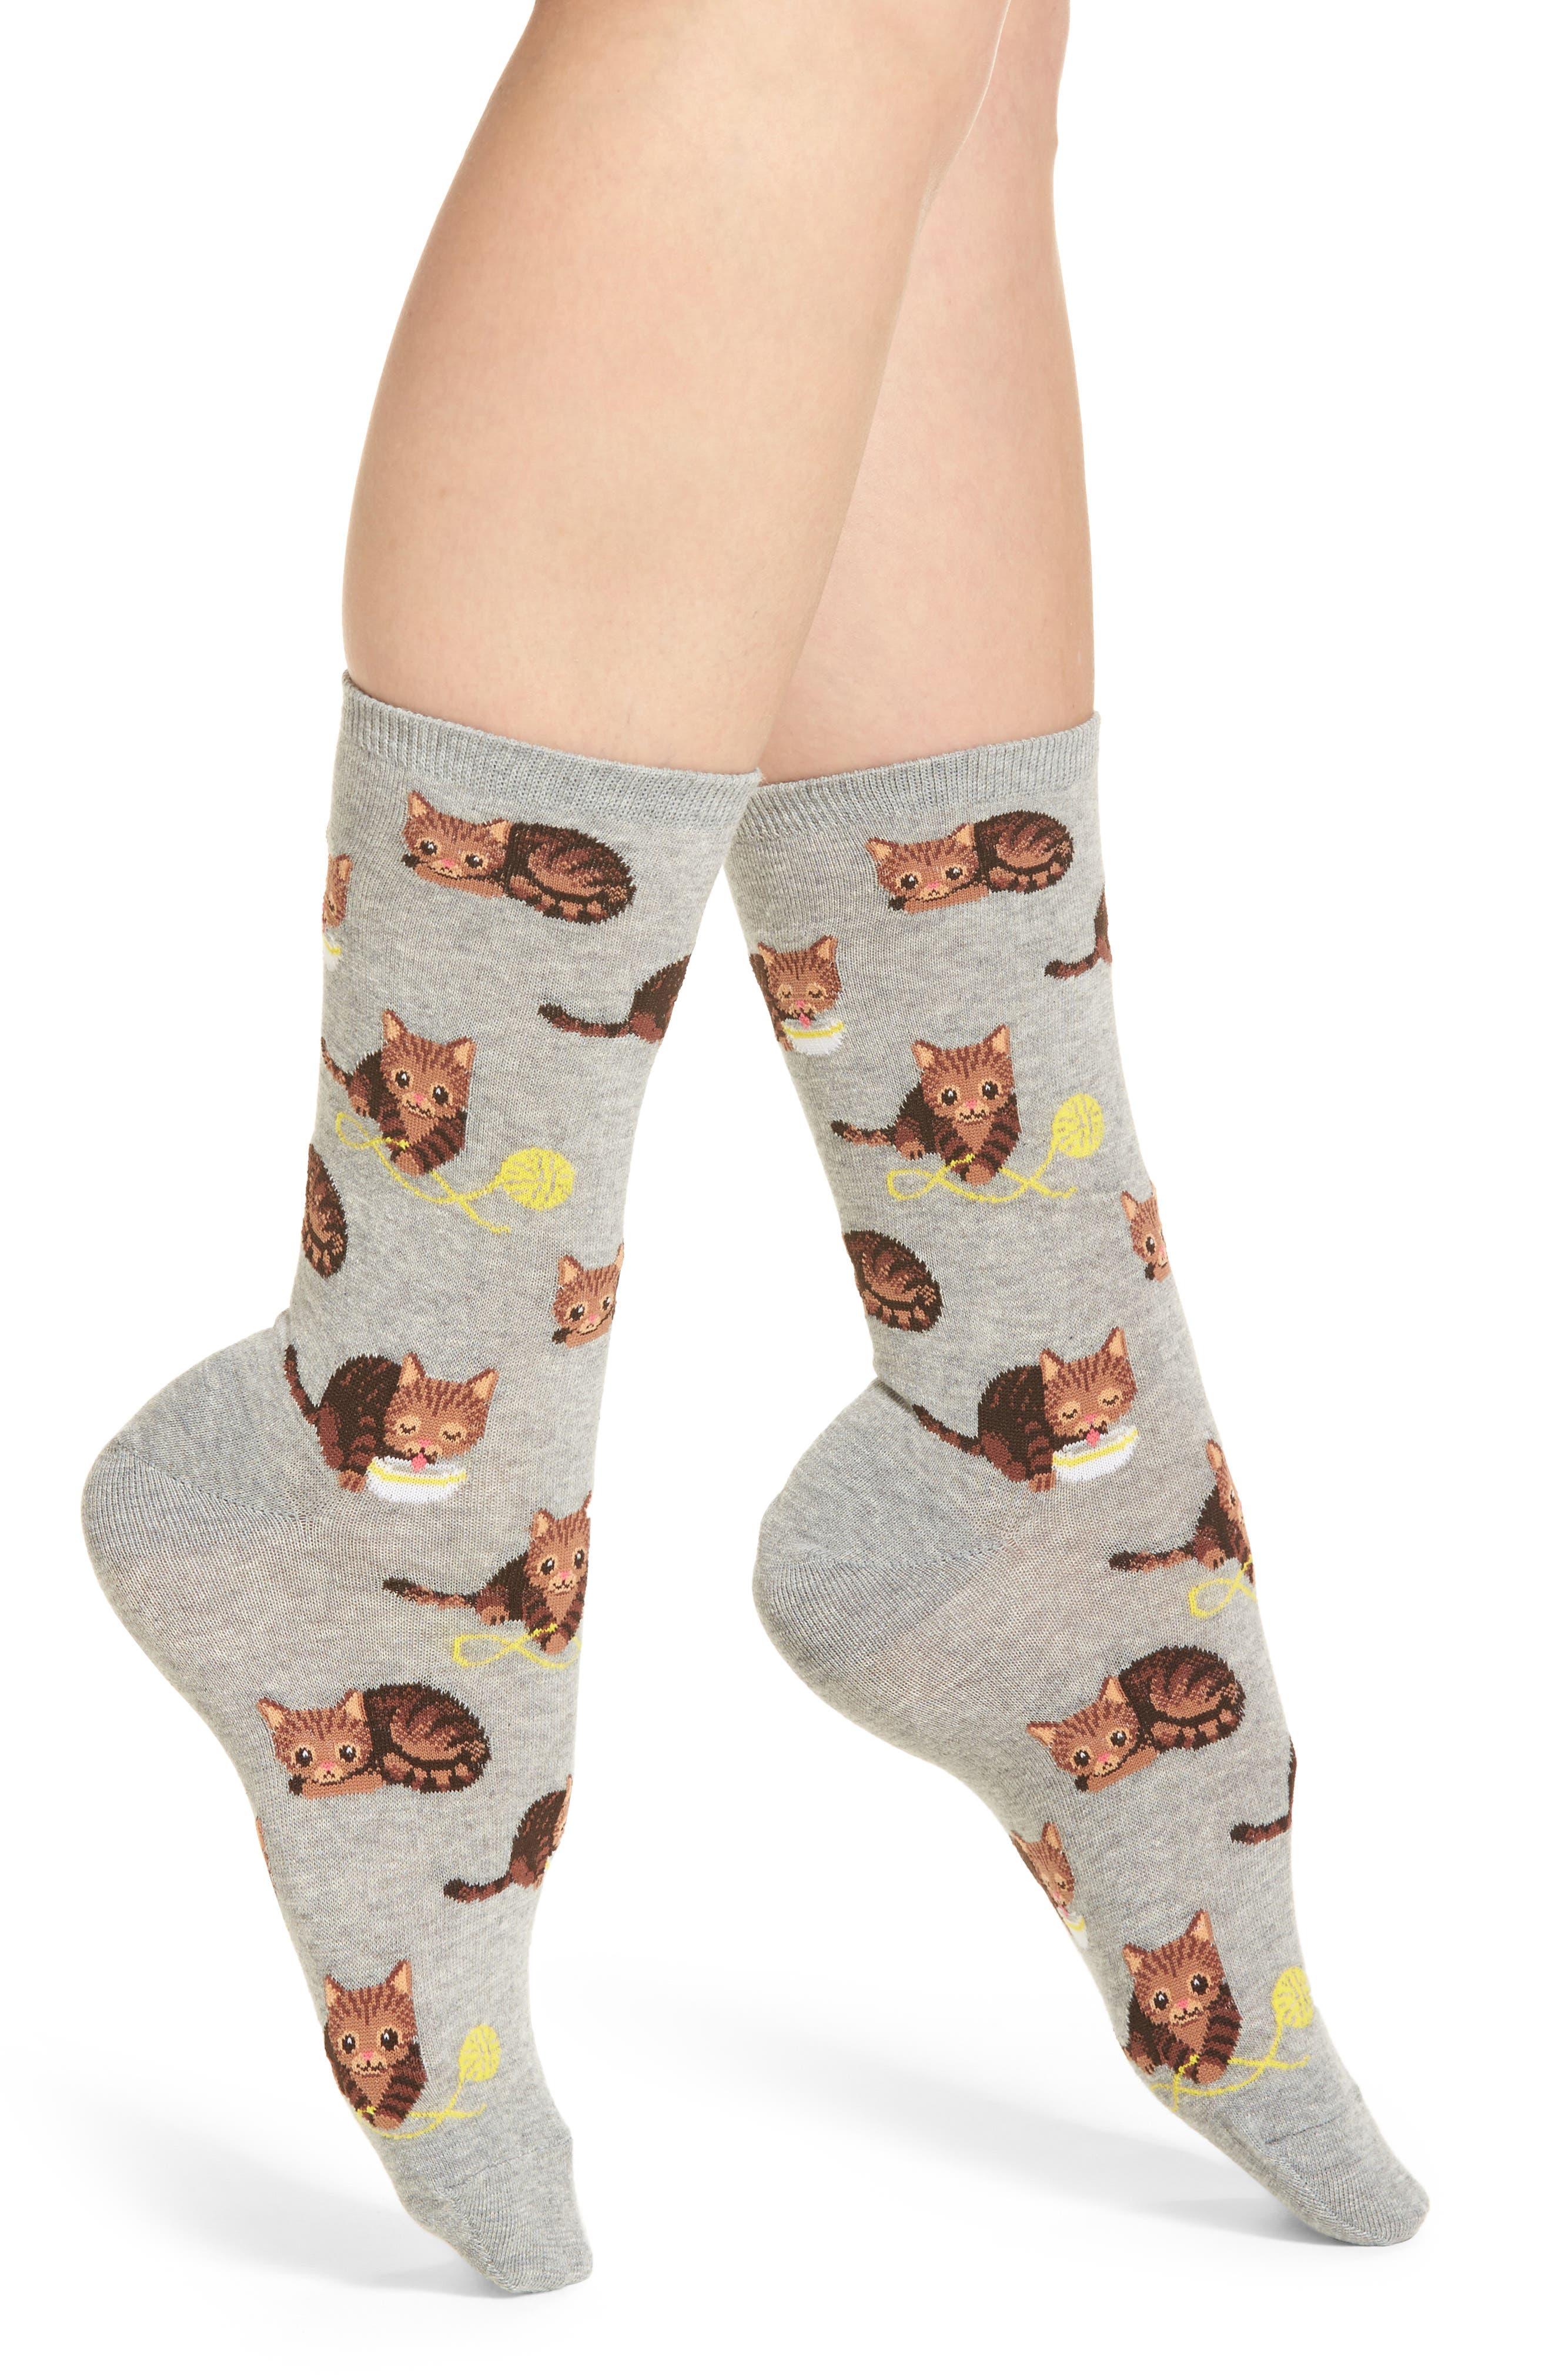 Cat & Yarn Crew Socks,                         Main,                         color, 051